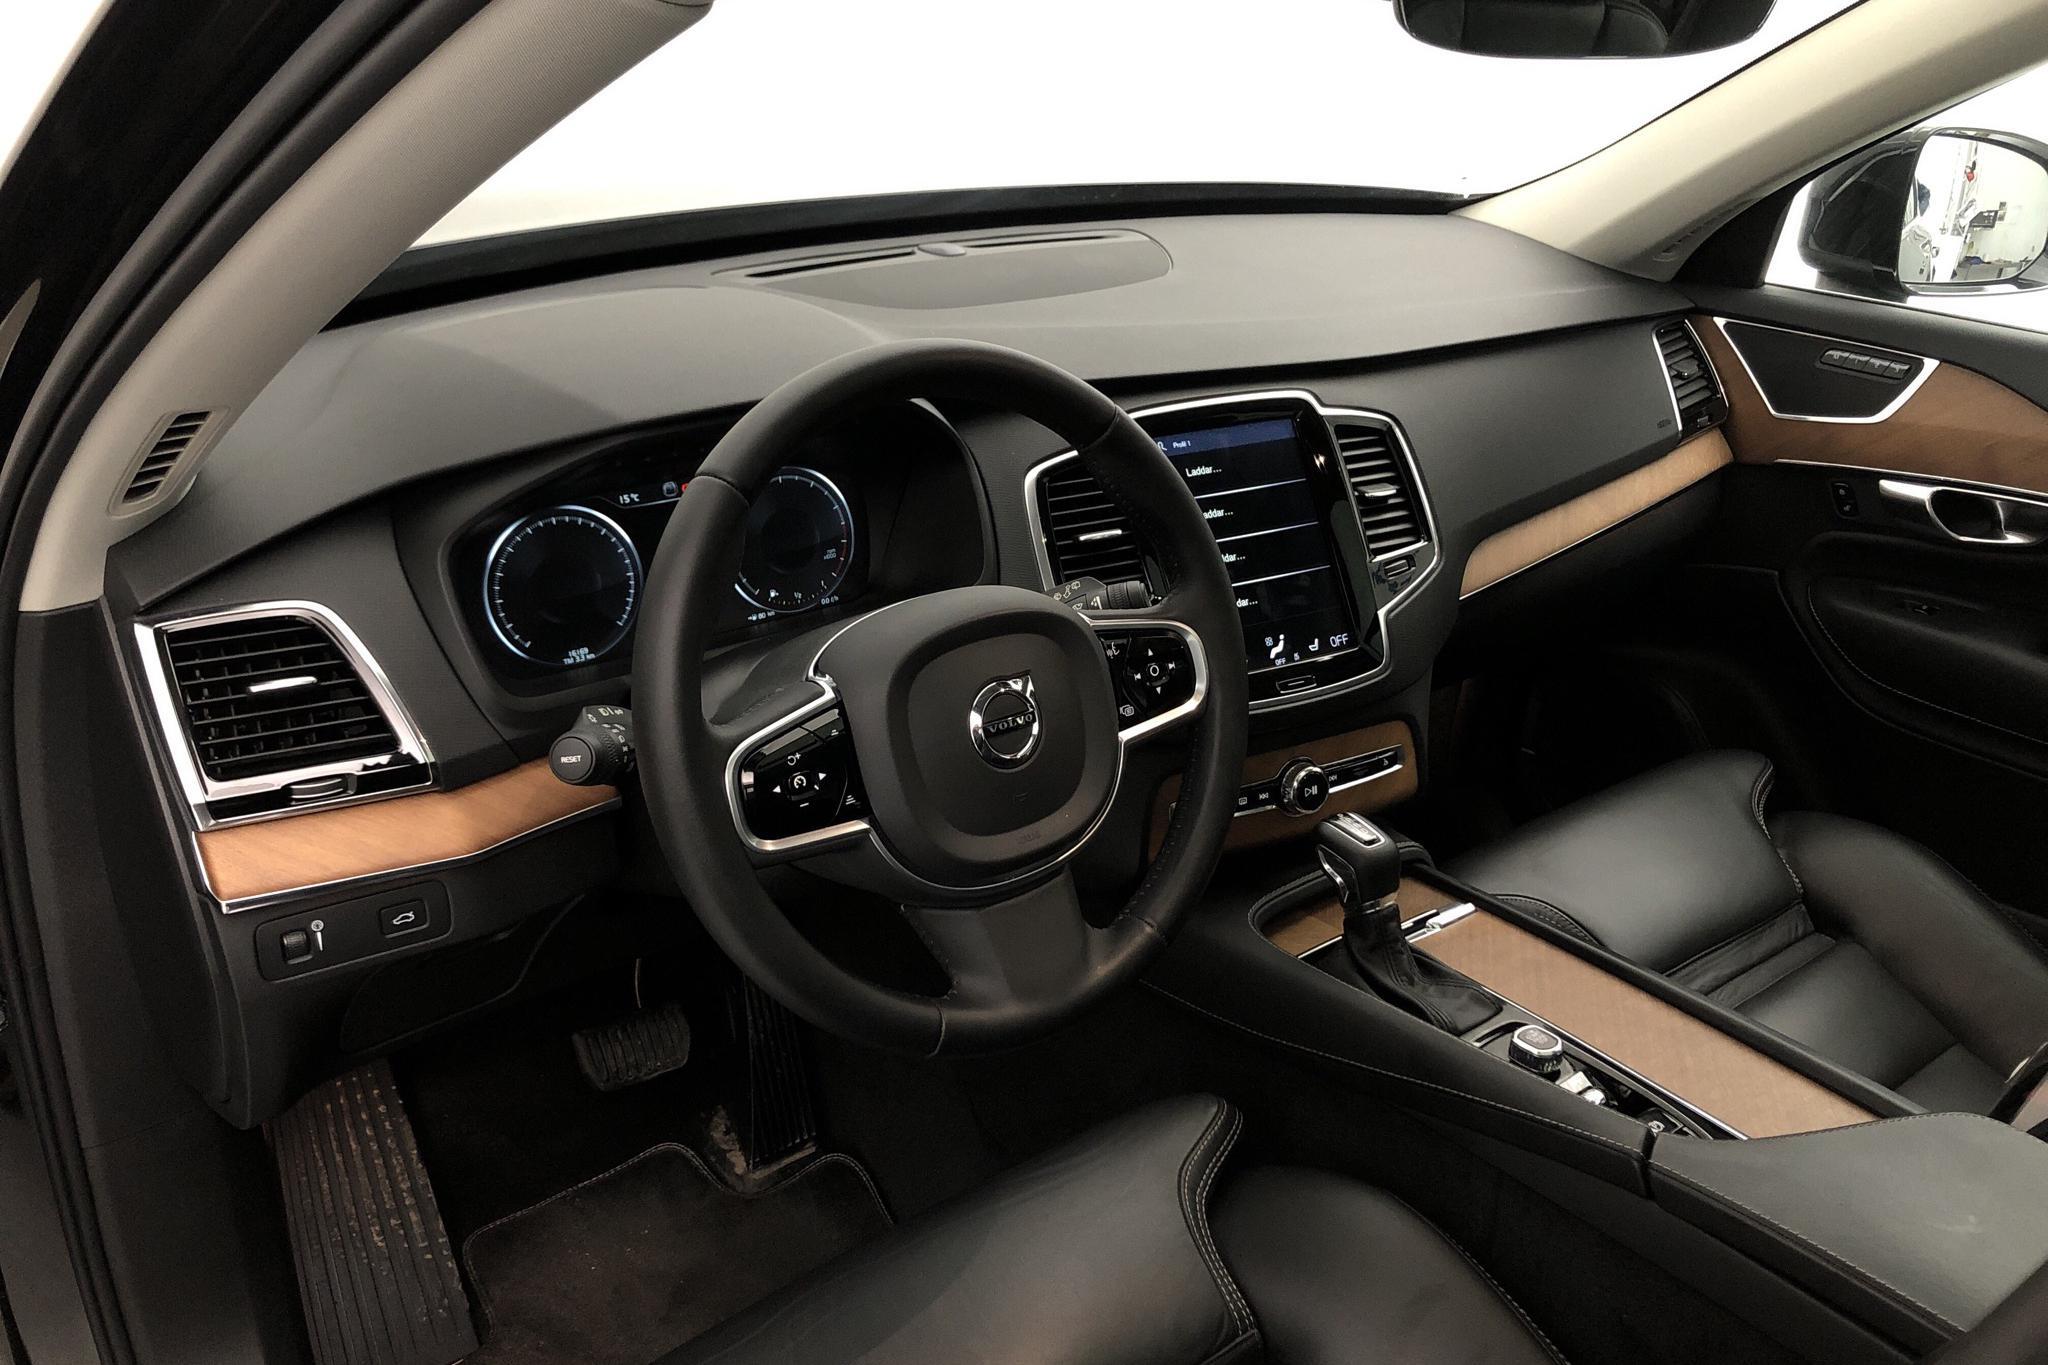 Volvo XC90 T6 AWD (310hk) - 16 160 km - Automatic - black - 2018